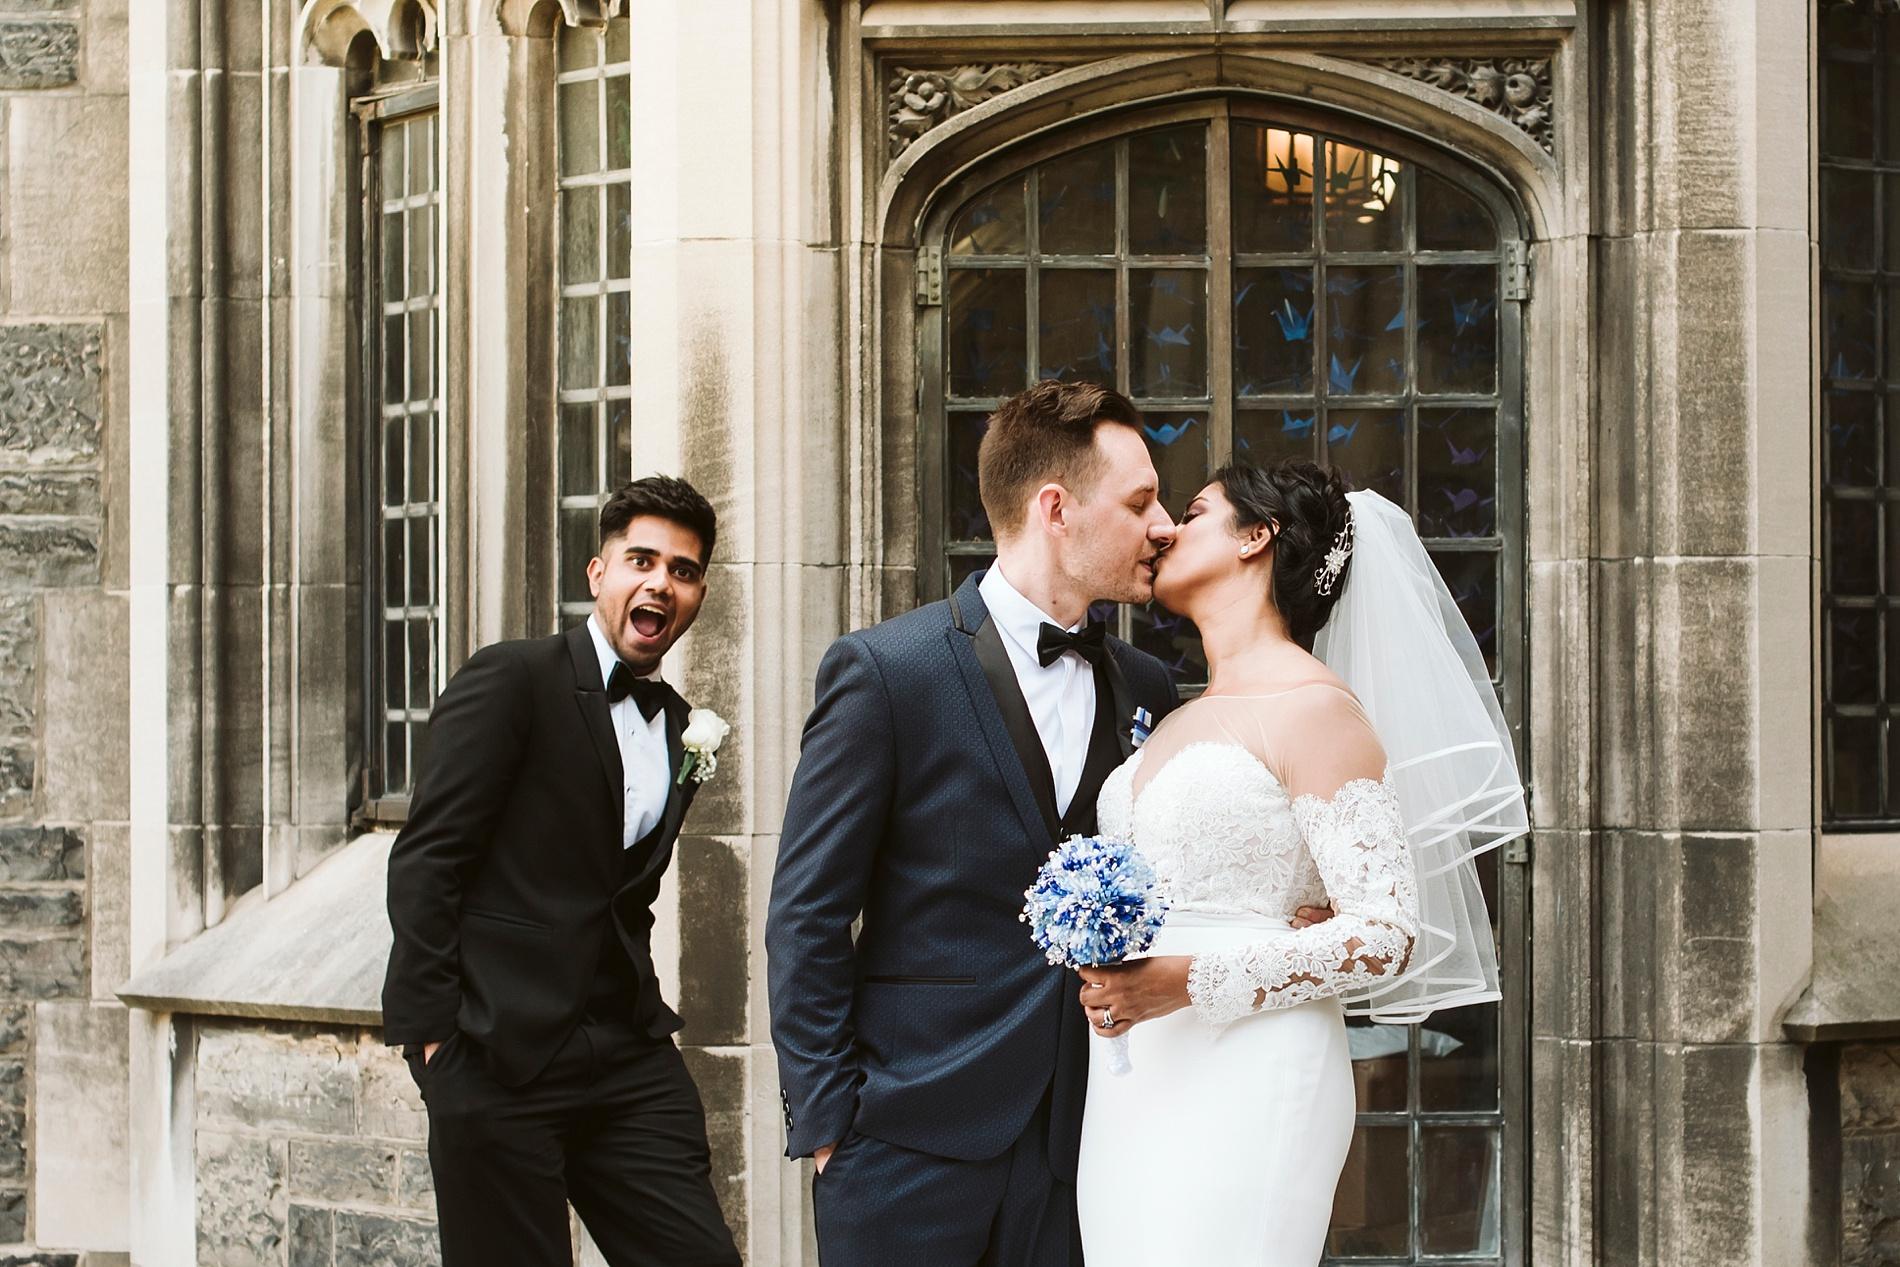 Eglington_Grand_Wedding_Photographer_0053.jpg